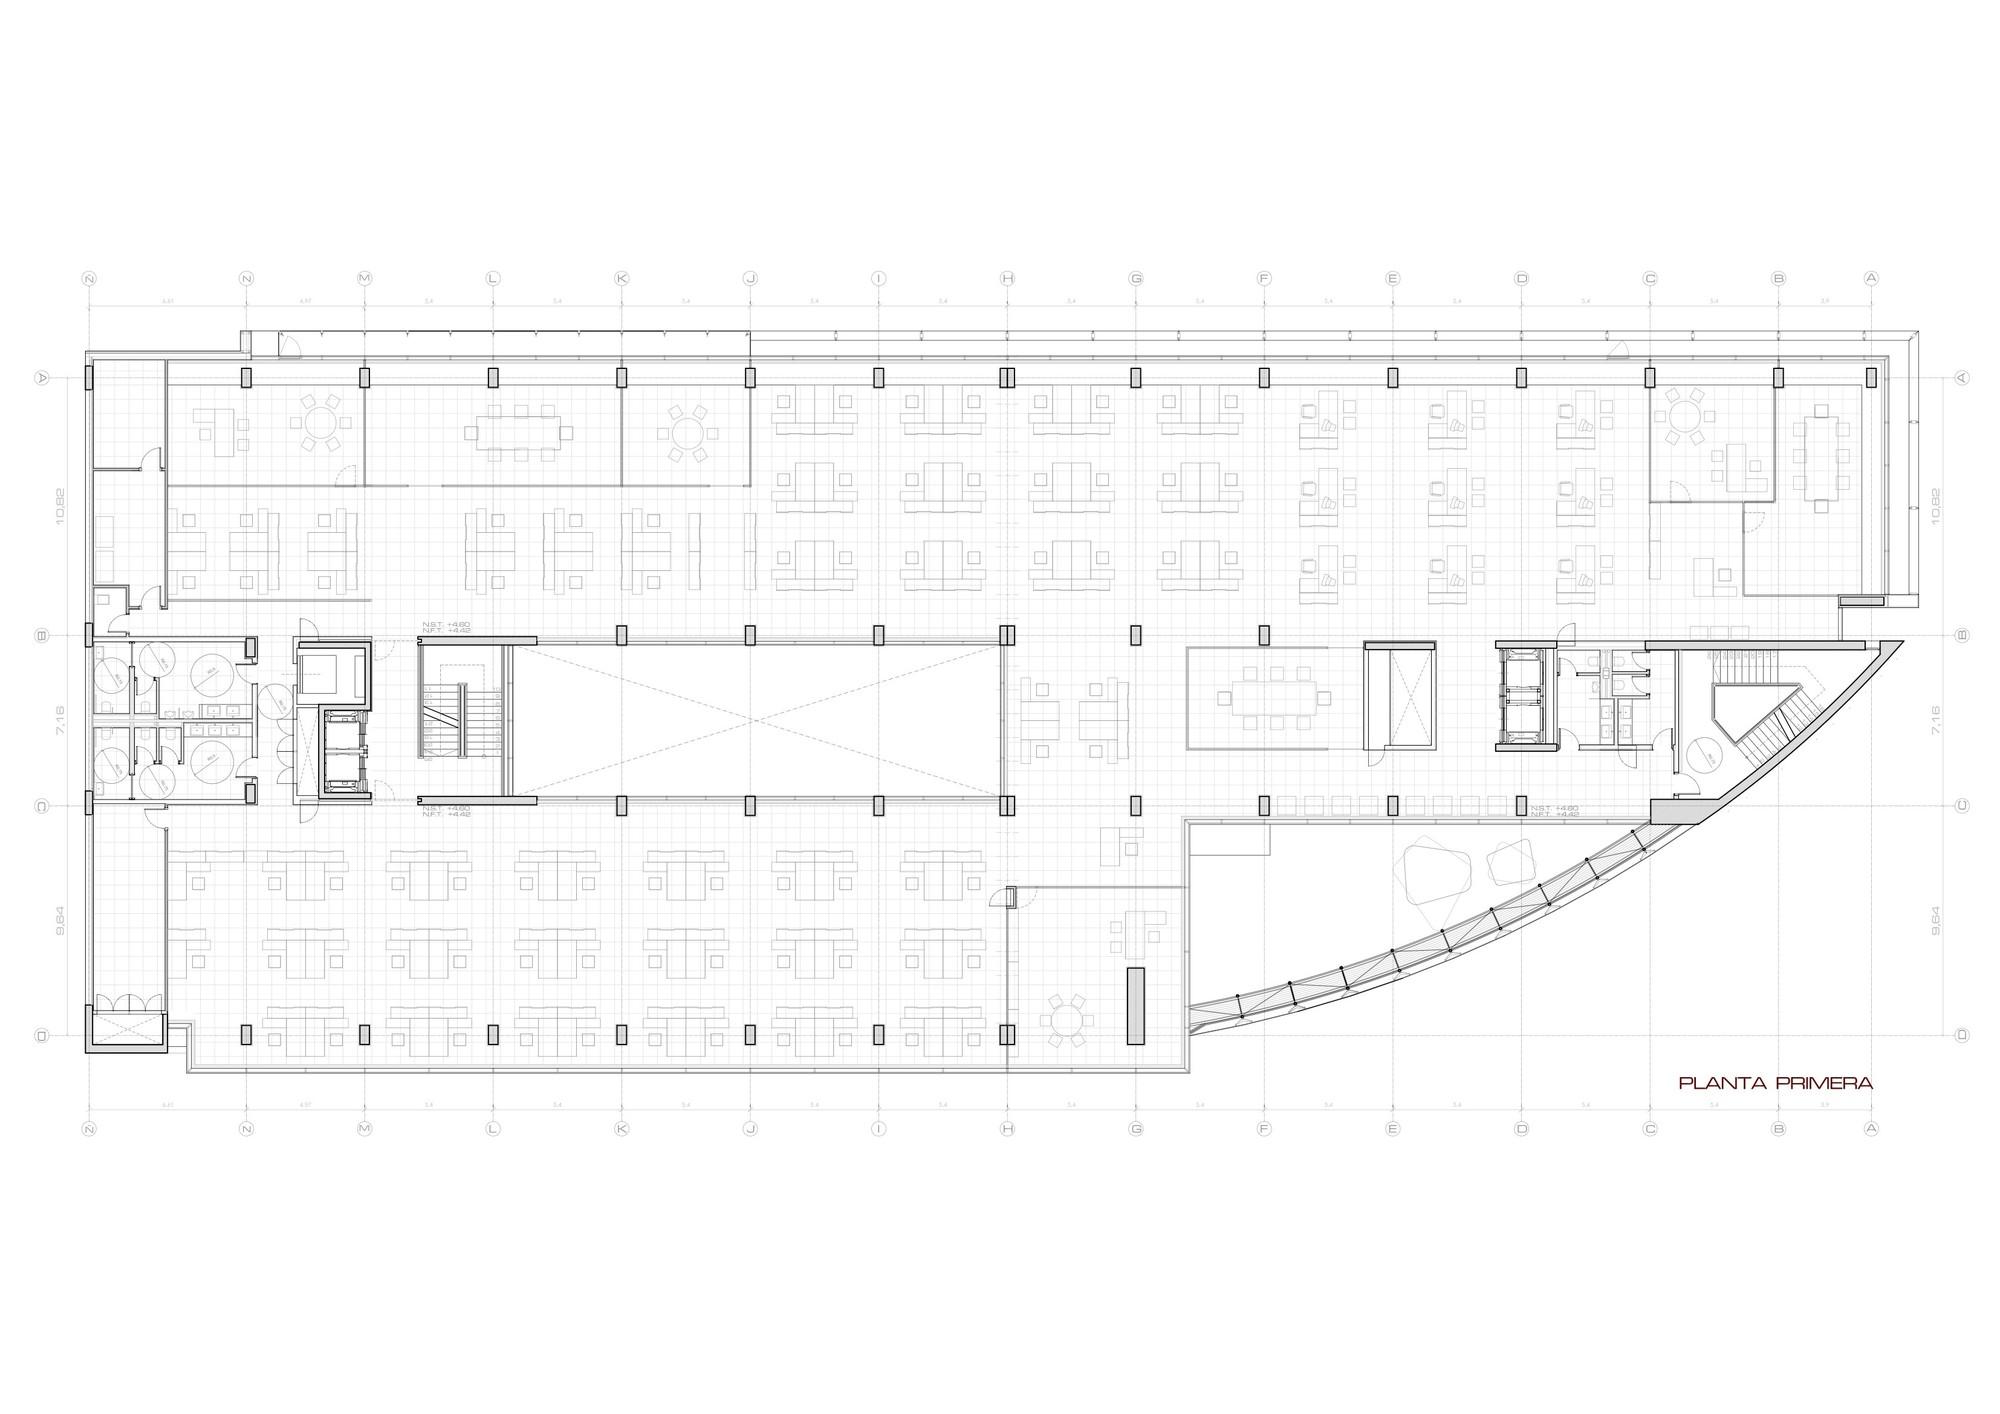 Galer a de edificio de oficinas en vitoria lh14 arquitectos 16 - Arquitectos en vitoria ...